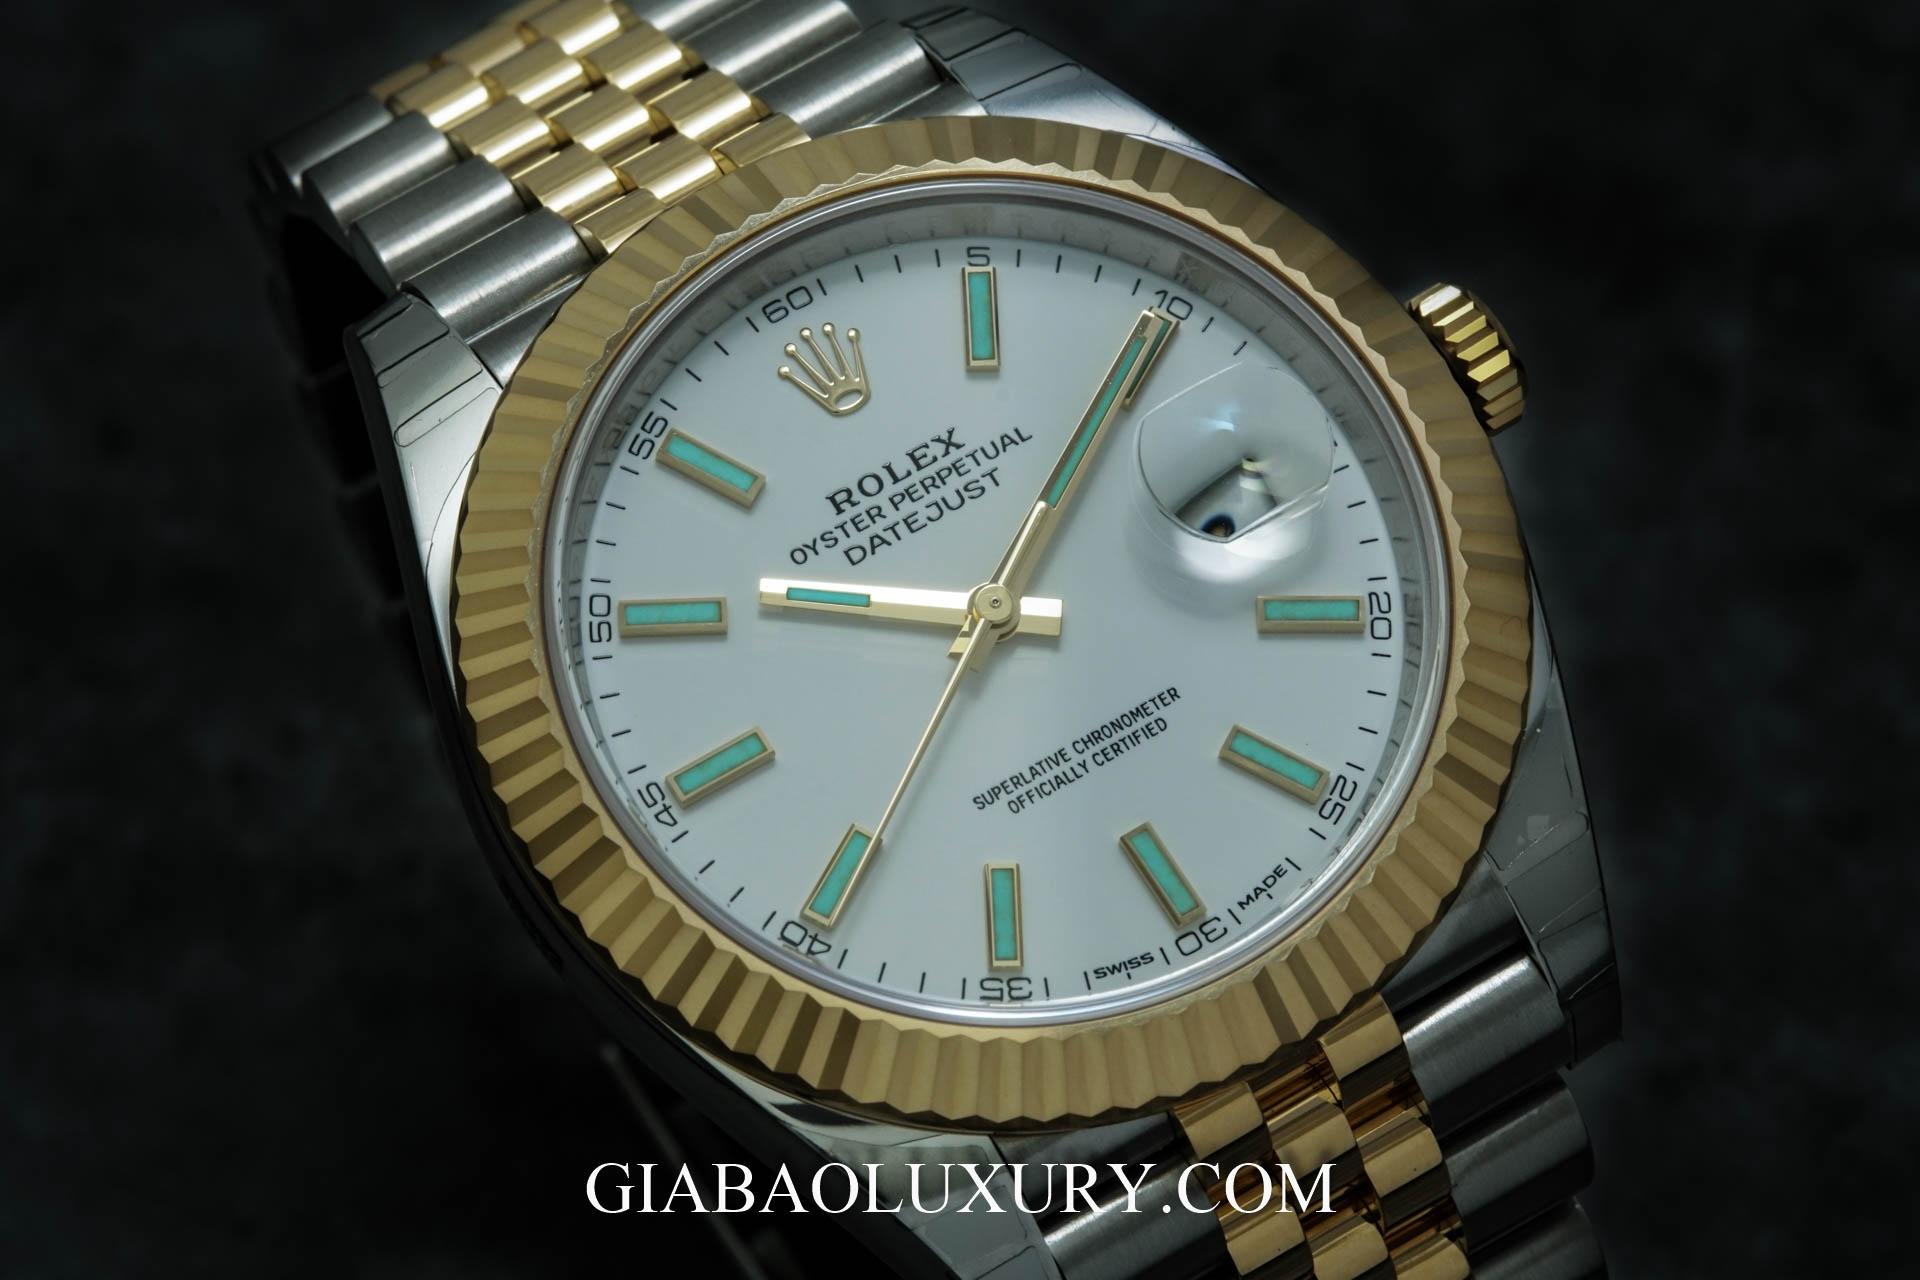 Đồng Hồ Rolex Datejust 126333 Mặt Số Trắng